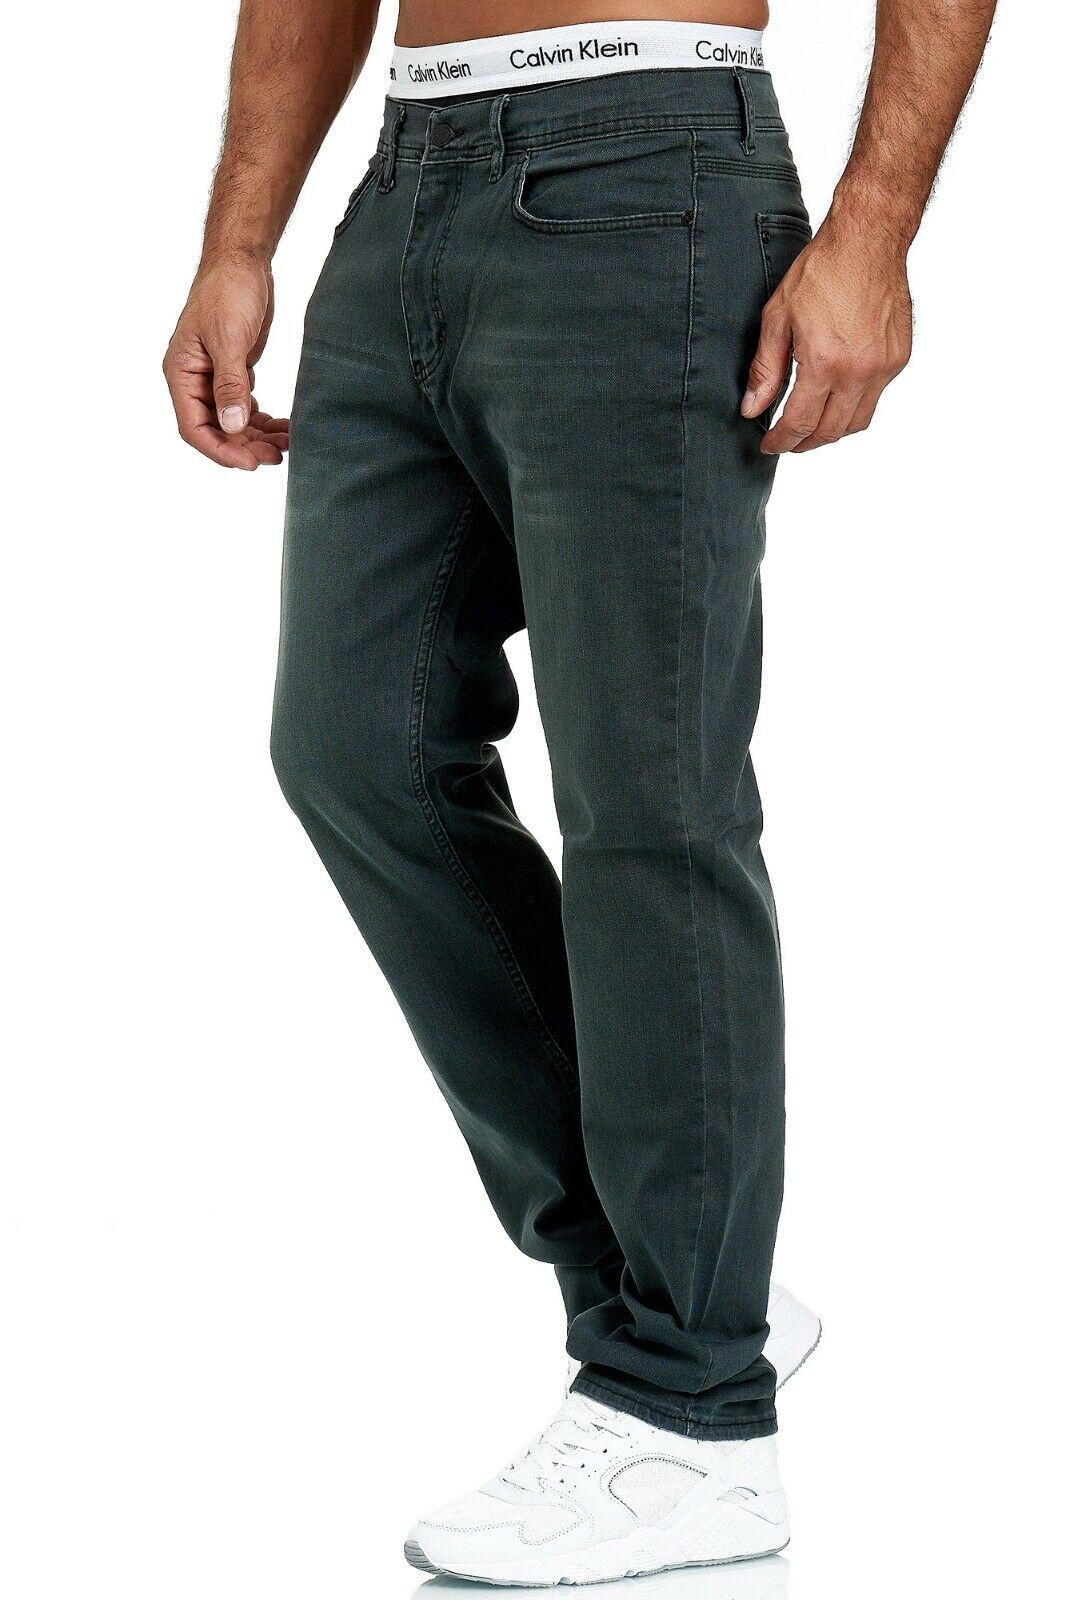 Herren-Jeans-Hose-Denim-KC-Black-Washed-Straight-Cut-Regular-Dicke-Naht-naehte Indexbild 47